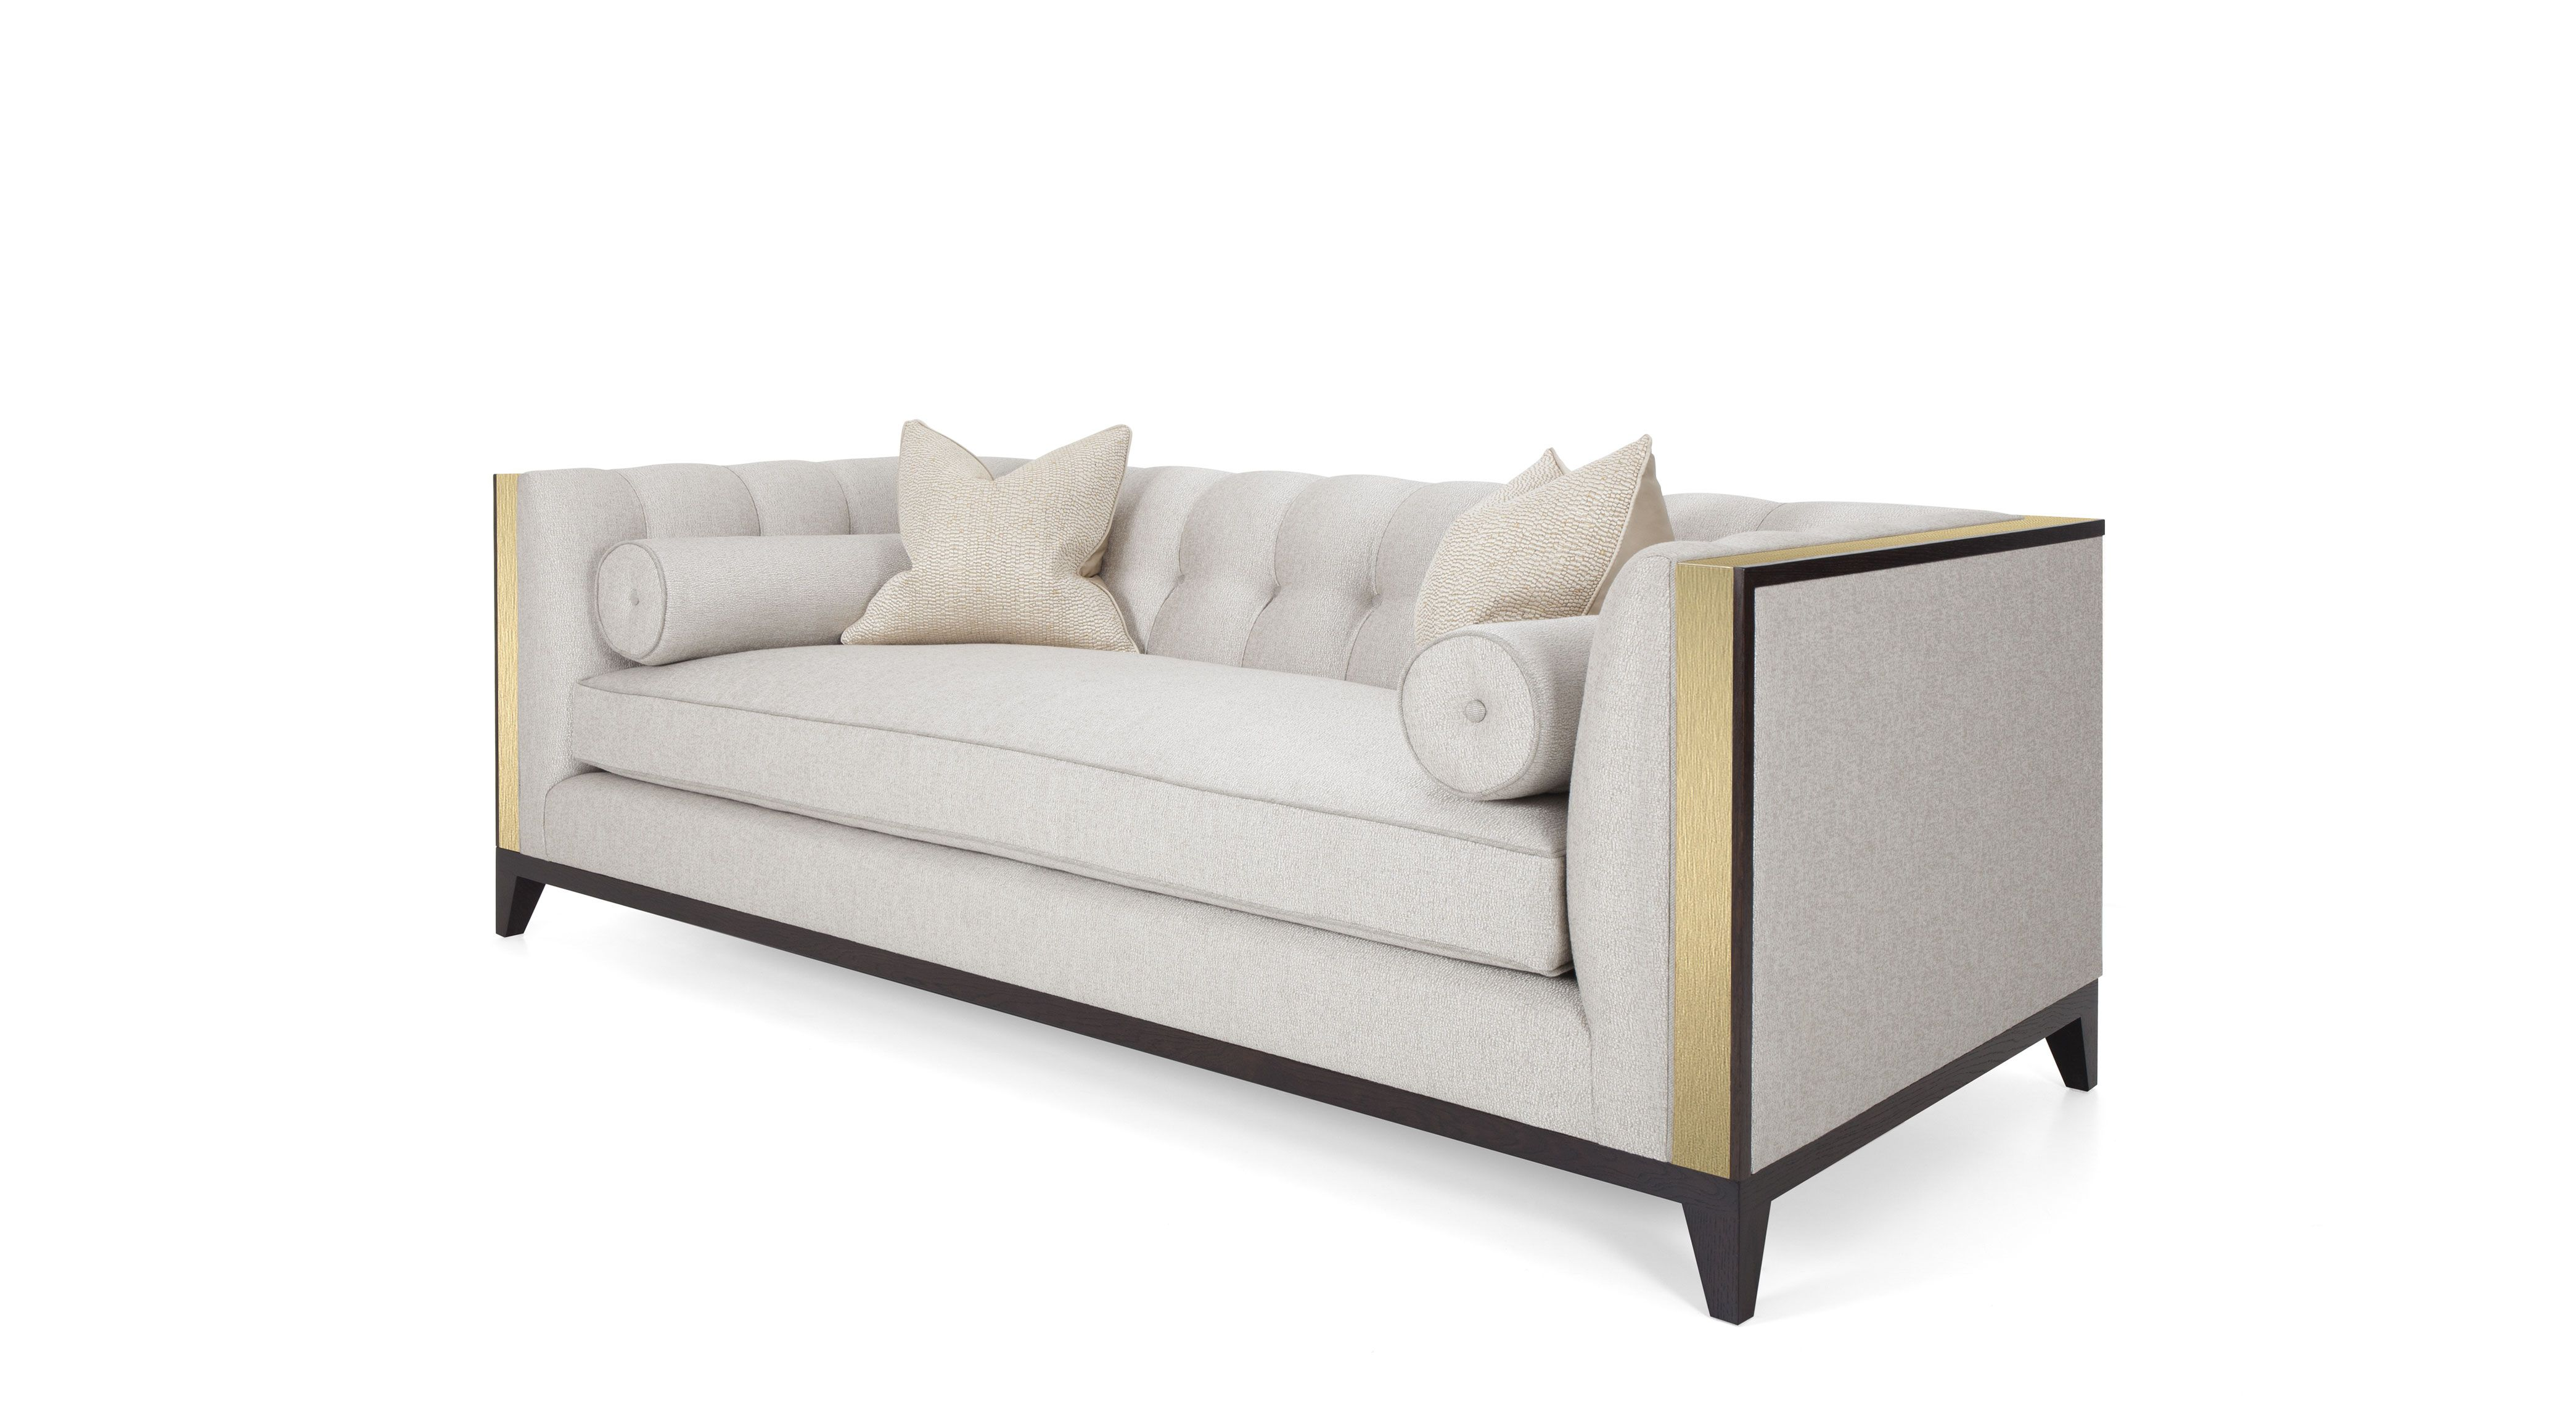 zurich bespoke sofa london sofa pinterest bespoke sofas